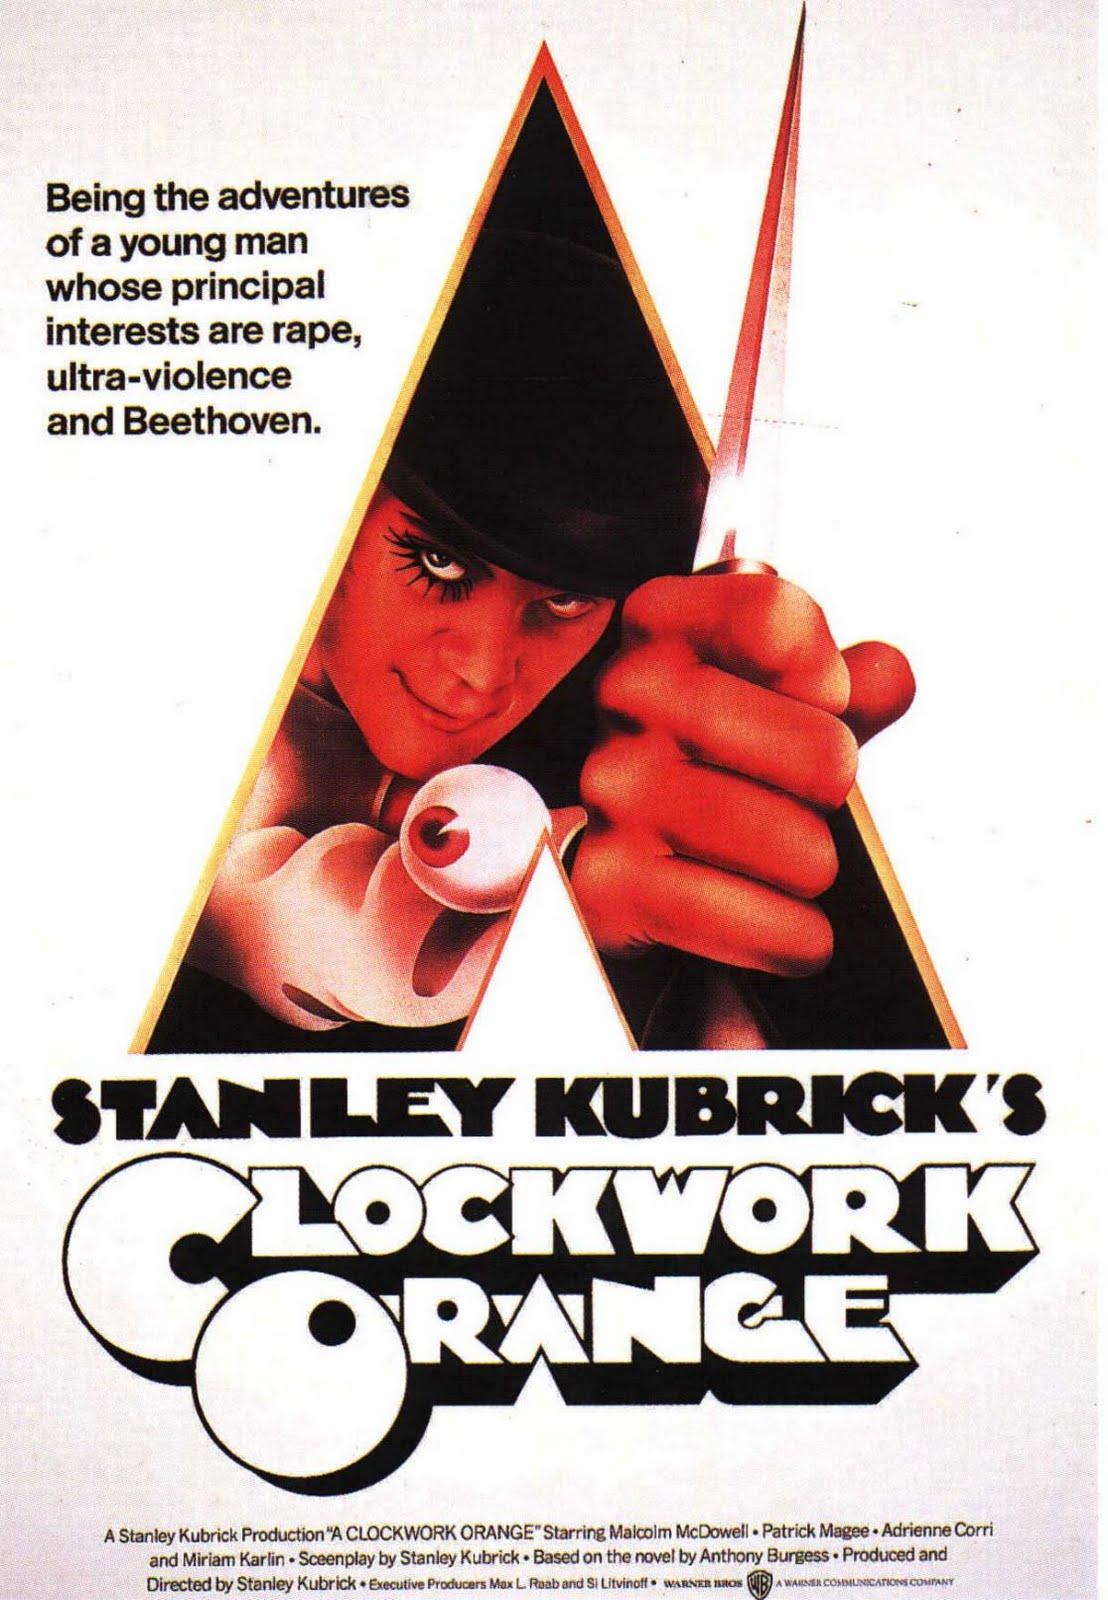 DOWNLOAD FREE MP4 MOVIES: Clockwork Orange